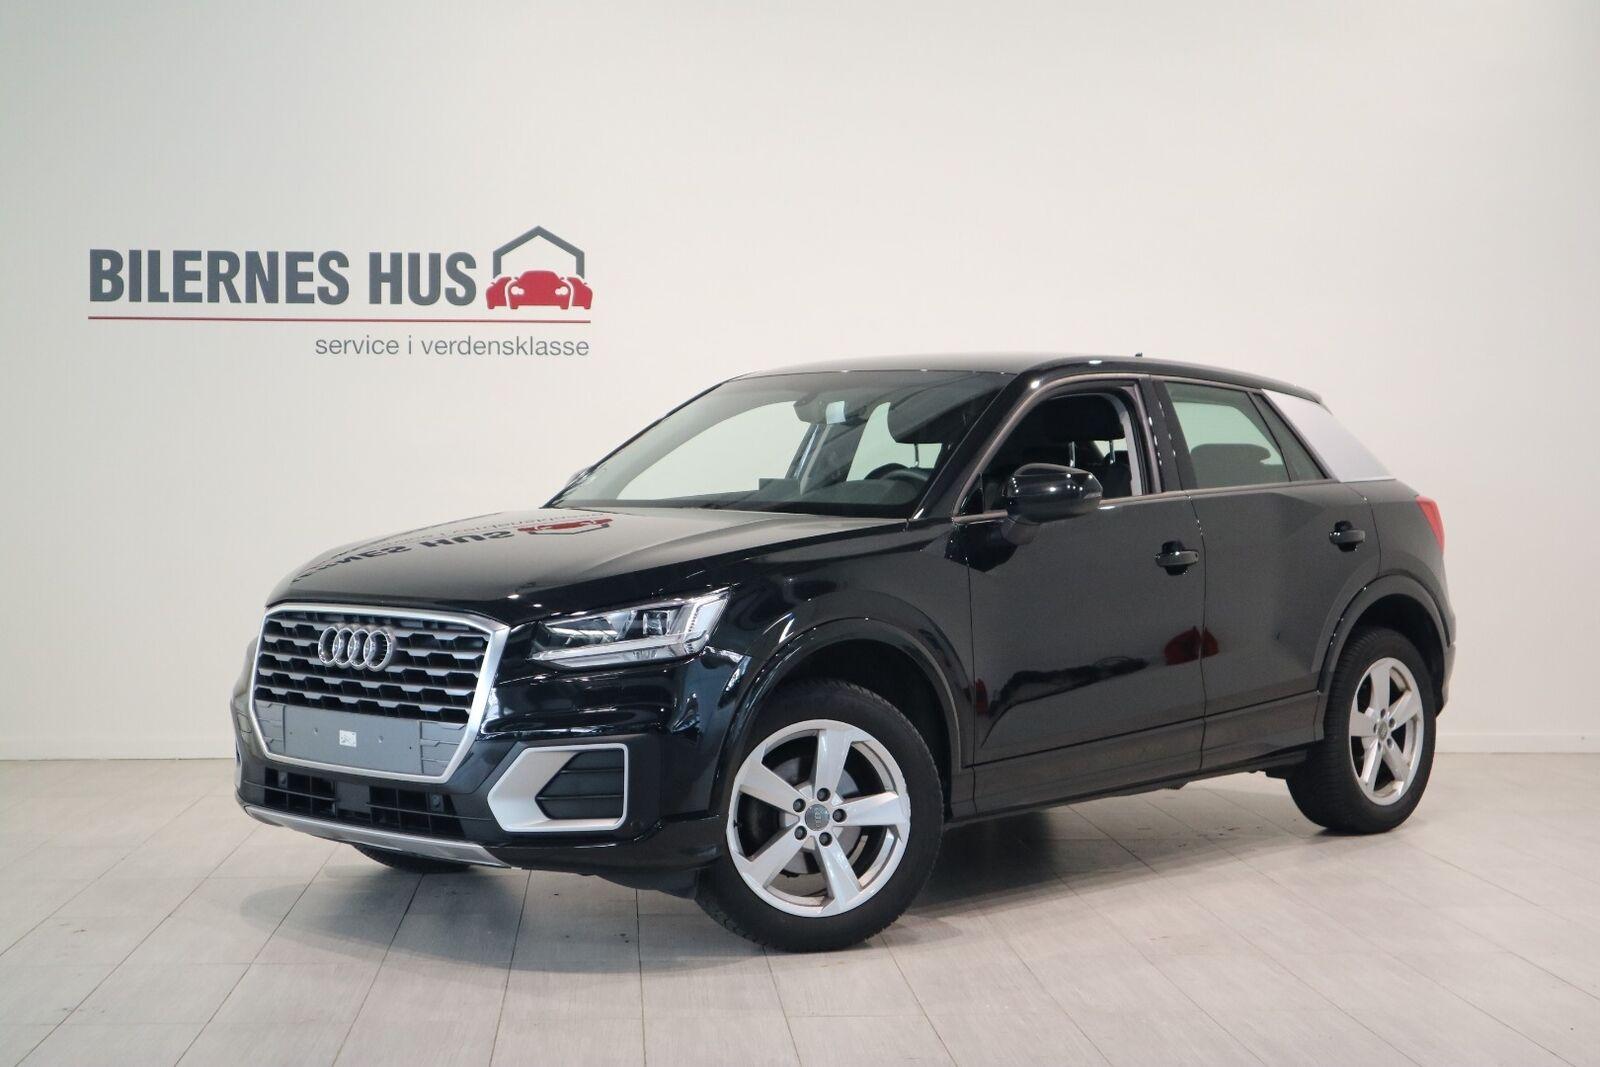 Audi Q2 Billede 6